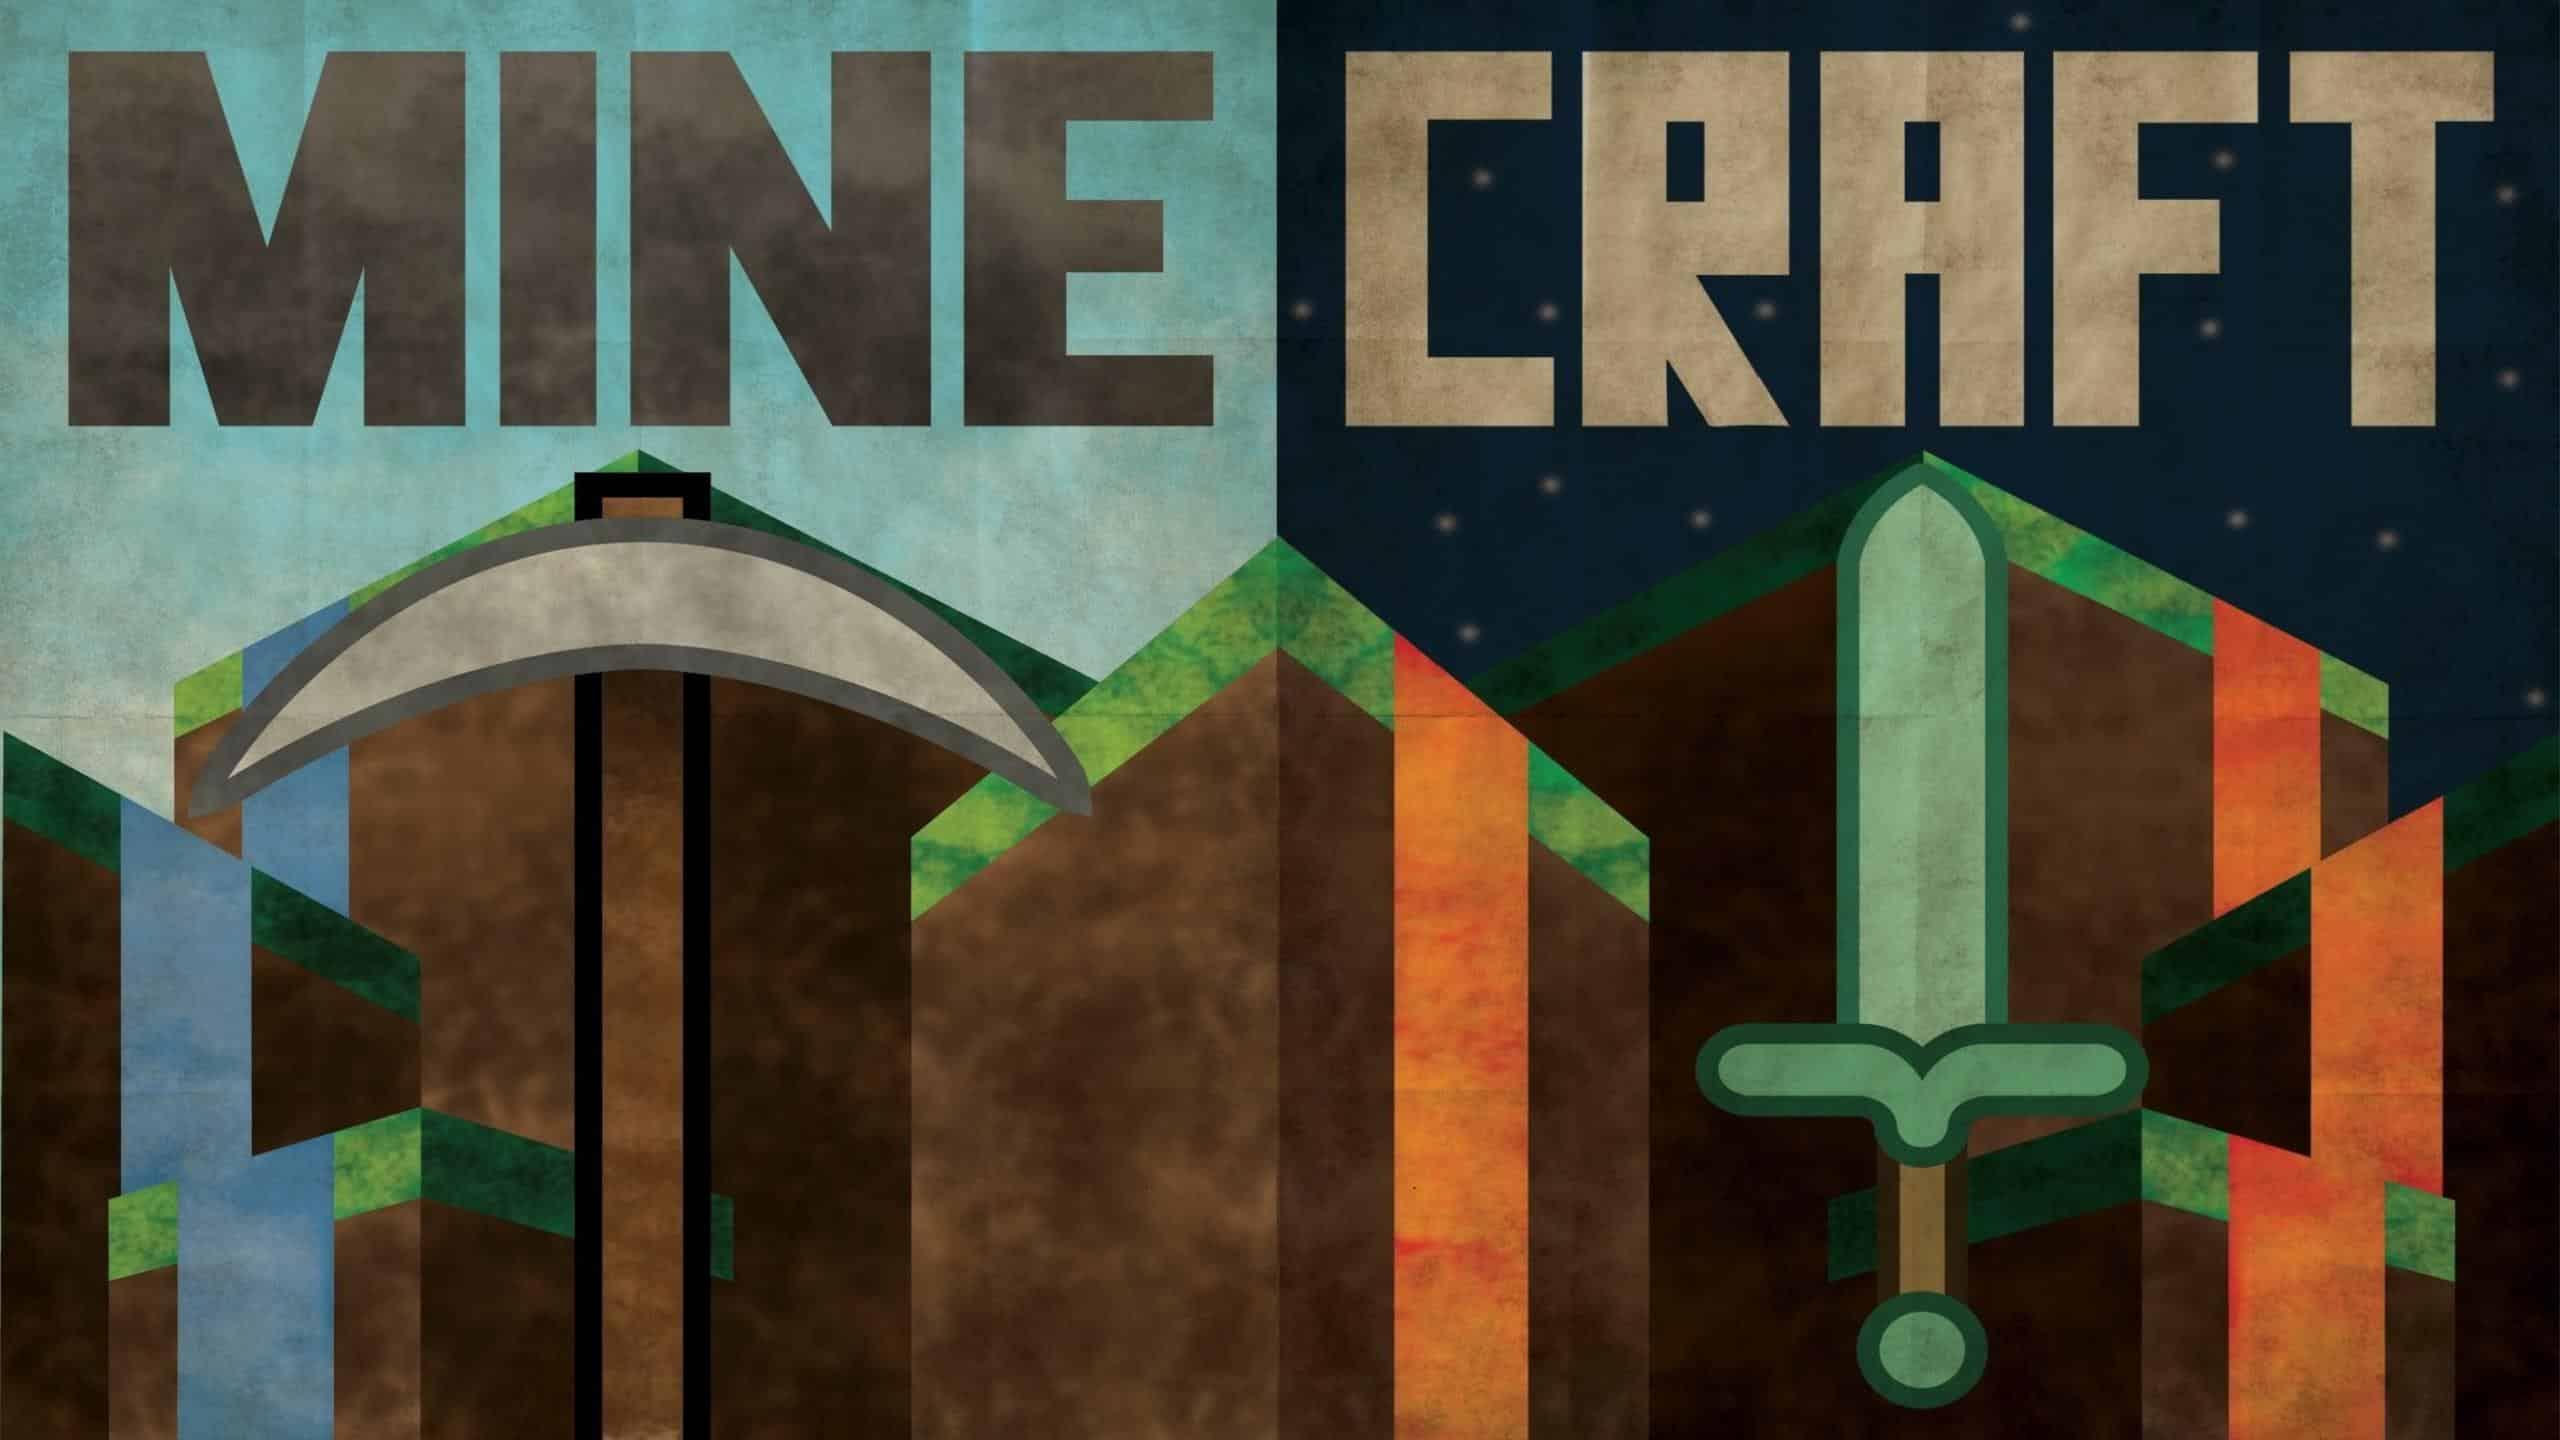 Top Wallpaper Minecraft Poster - minecraft-propaganda-poster-wqhd-1440p-wallpaper  You Should Have_282930.jpg